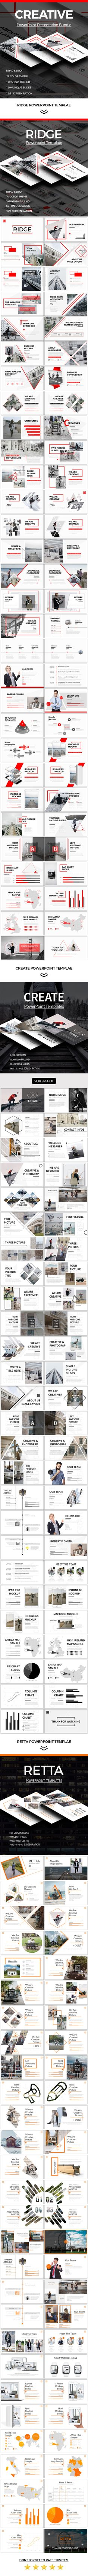 Bundle Creative PowerPoint Template